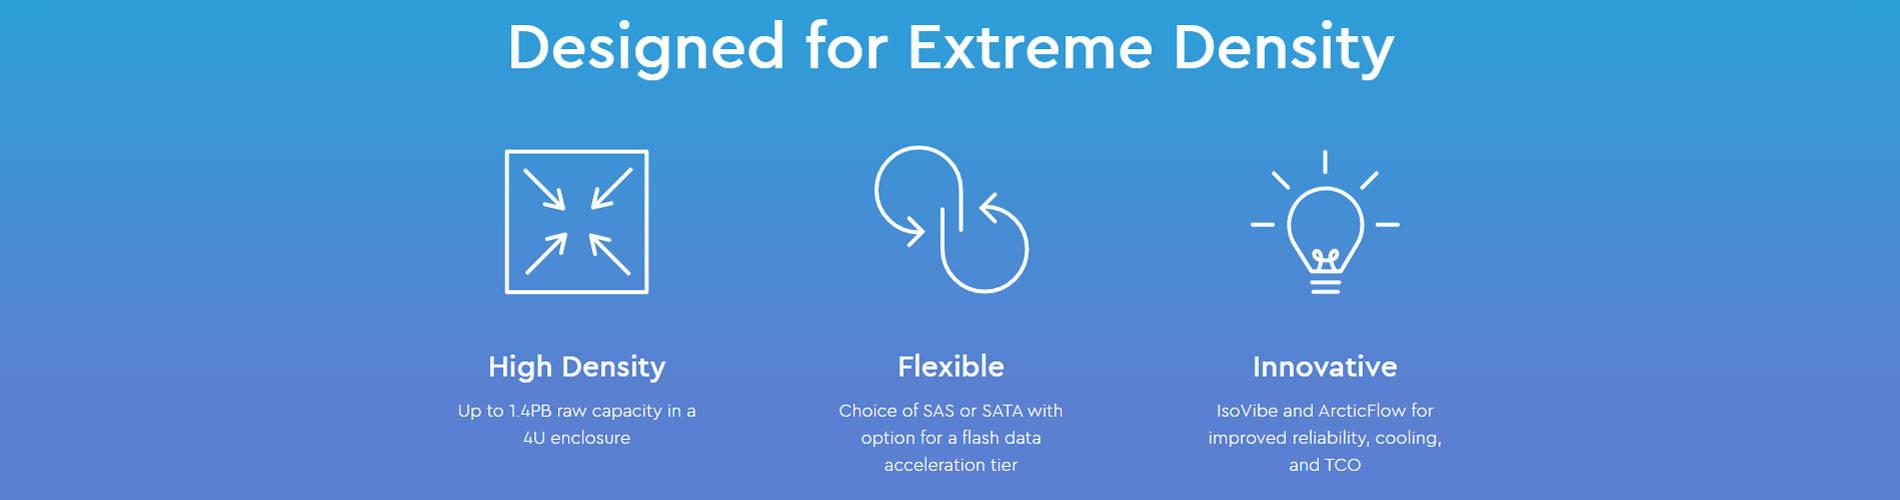 Designed for Extreme Density